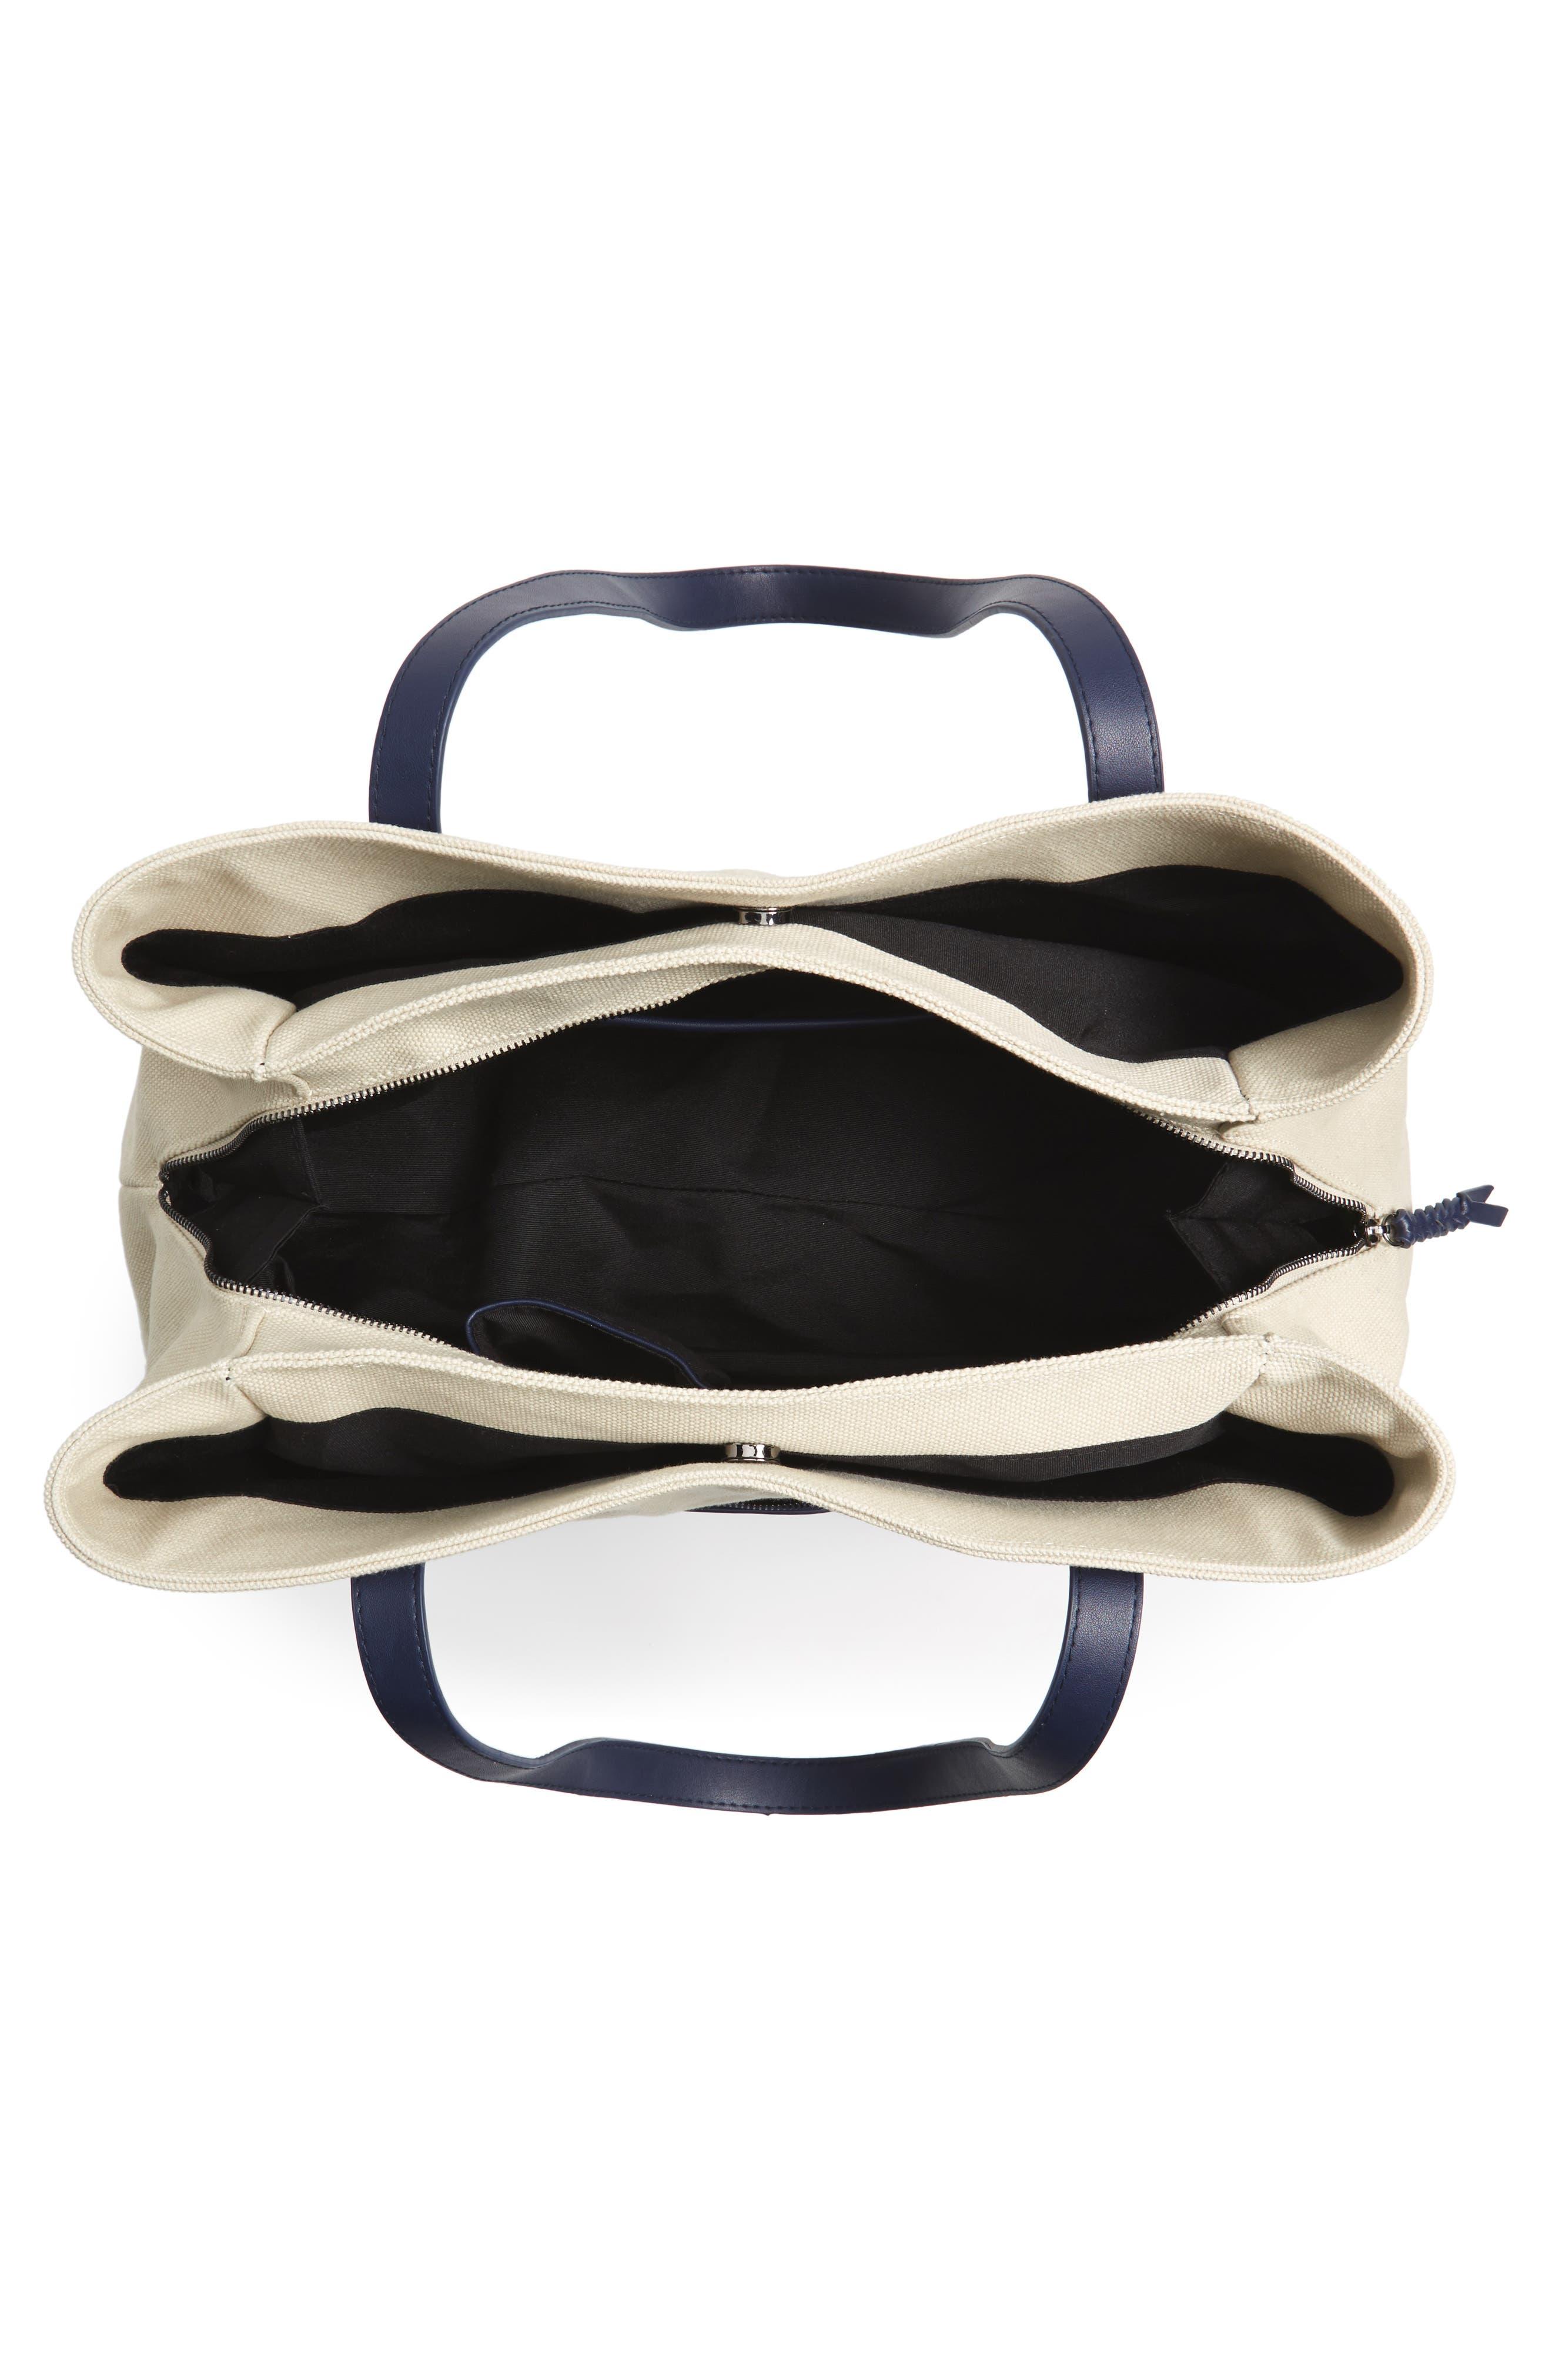 Two Toned Weekender Bag,                             Alternate thumbnail 4, color,                             Cream/ Navy